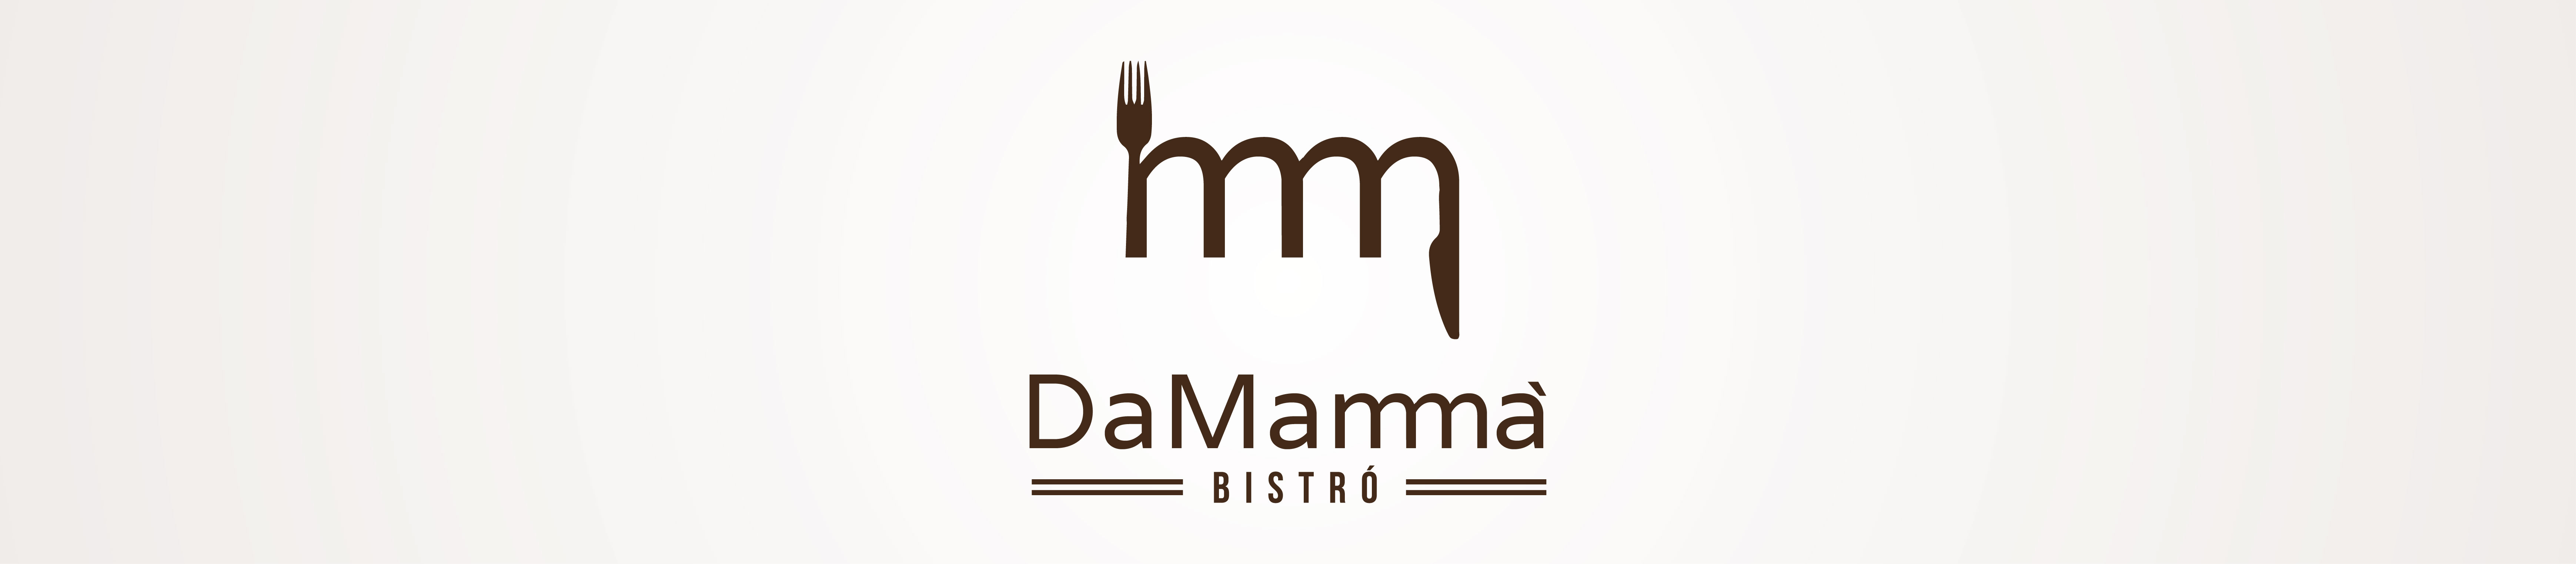 archicercle - damamma logo